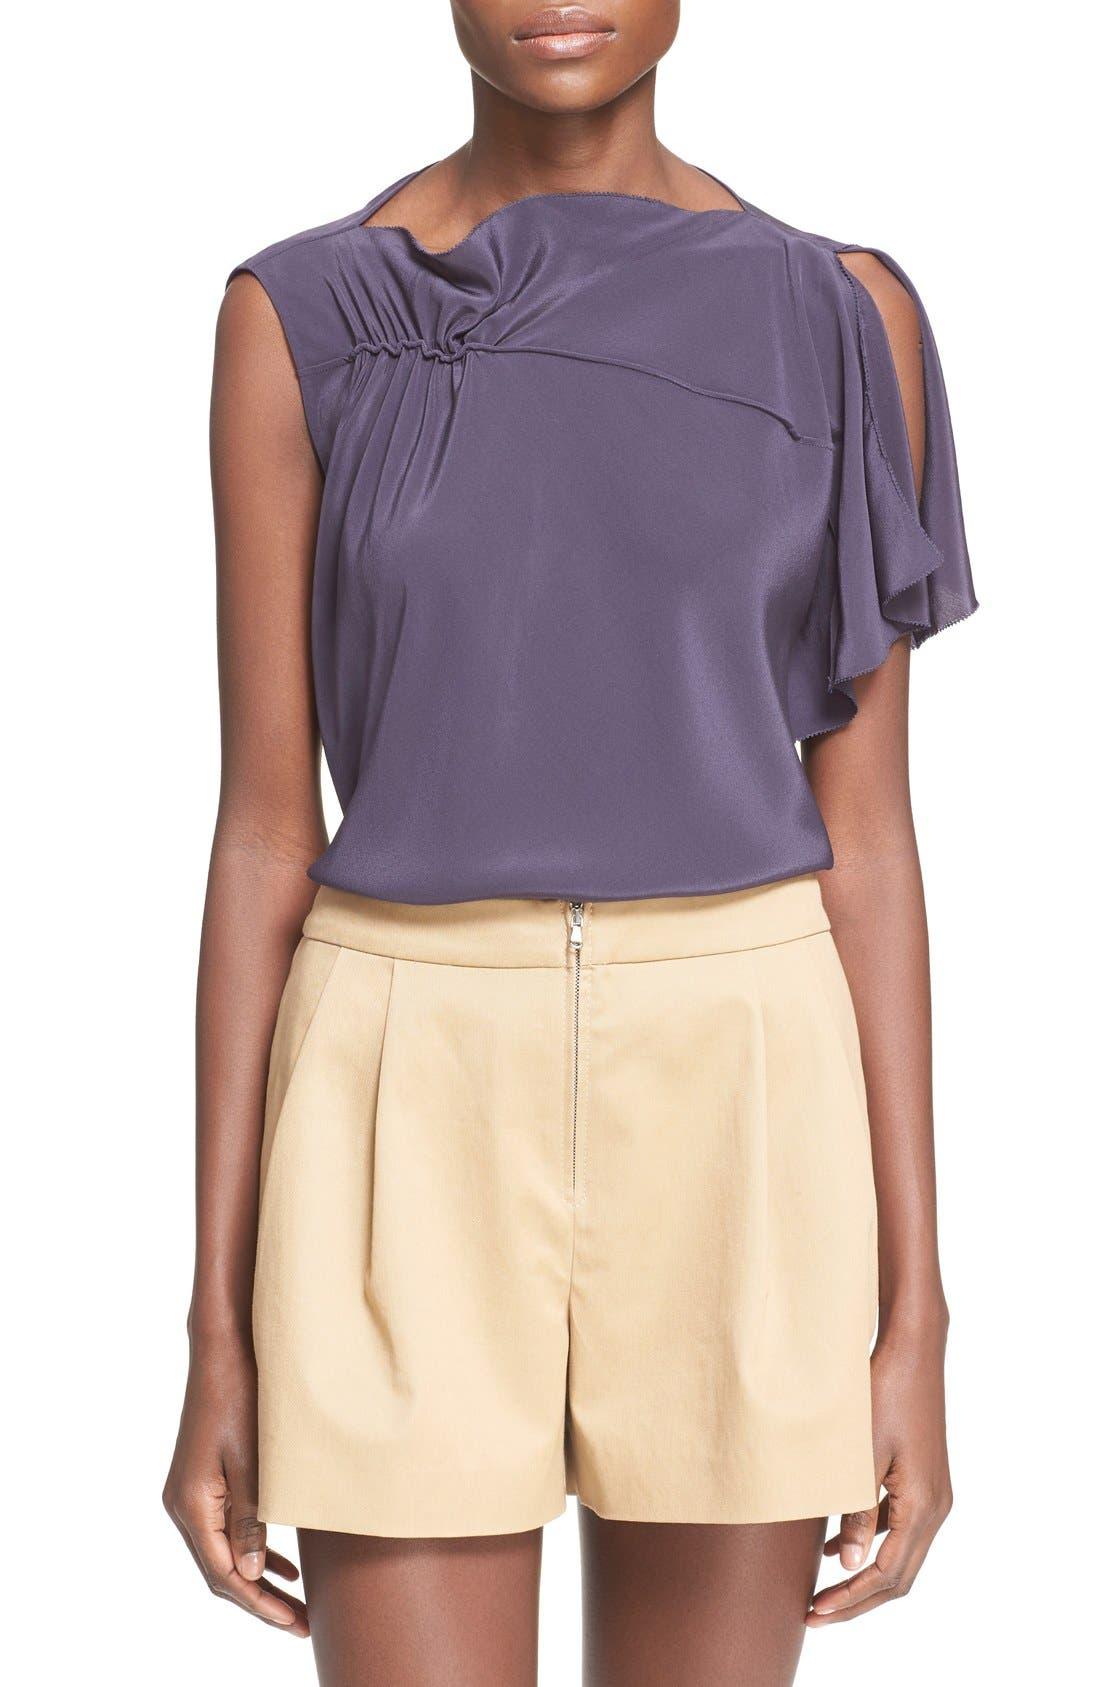 Alternate Image 1 Selected - 3.1 Phillip Lim Shirred Silk Top